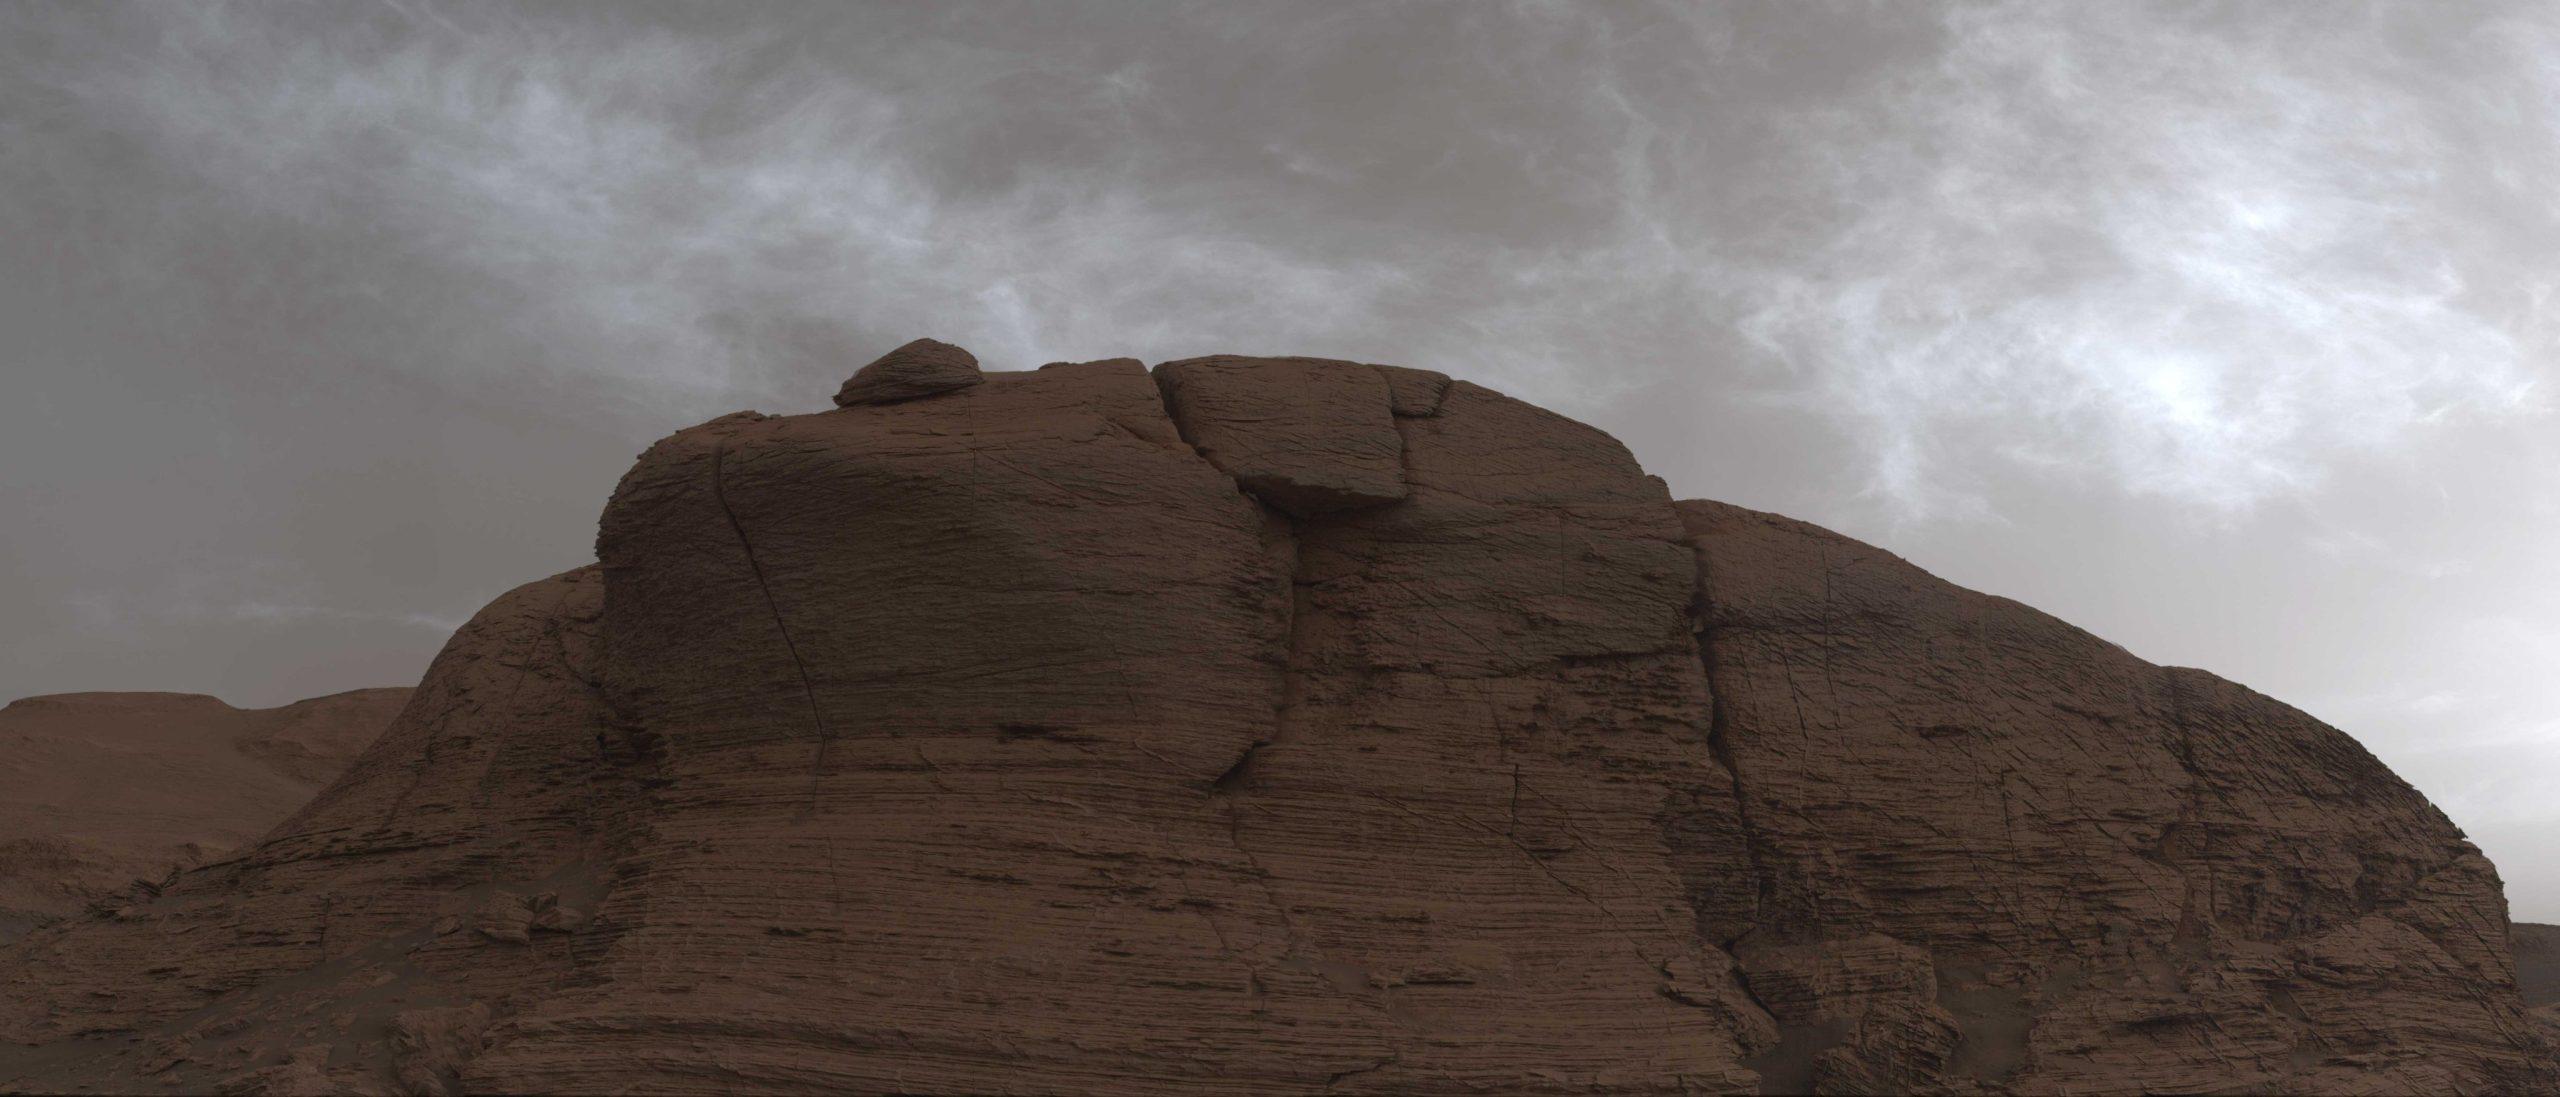 Curiosità su Marte nuvoloso oggi